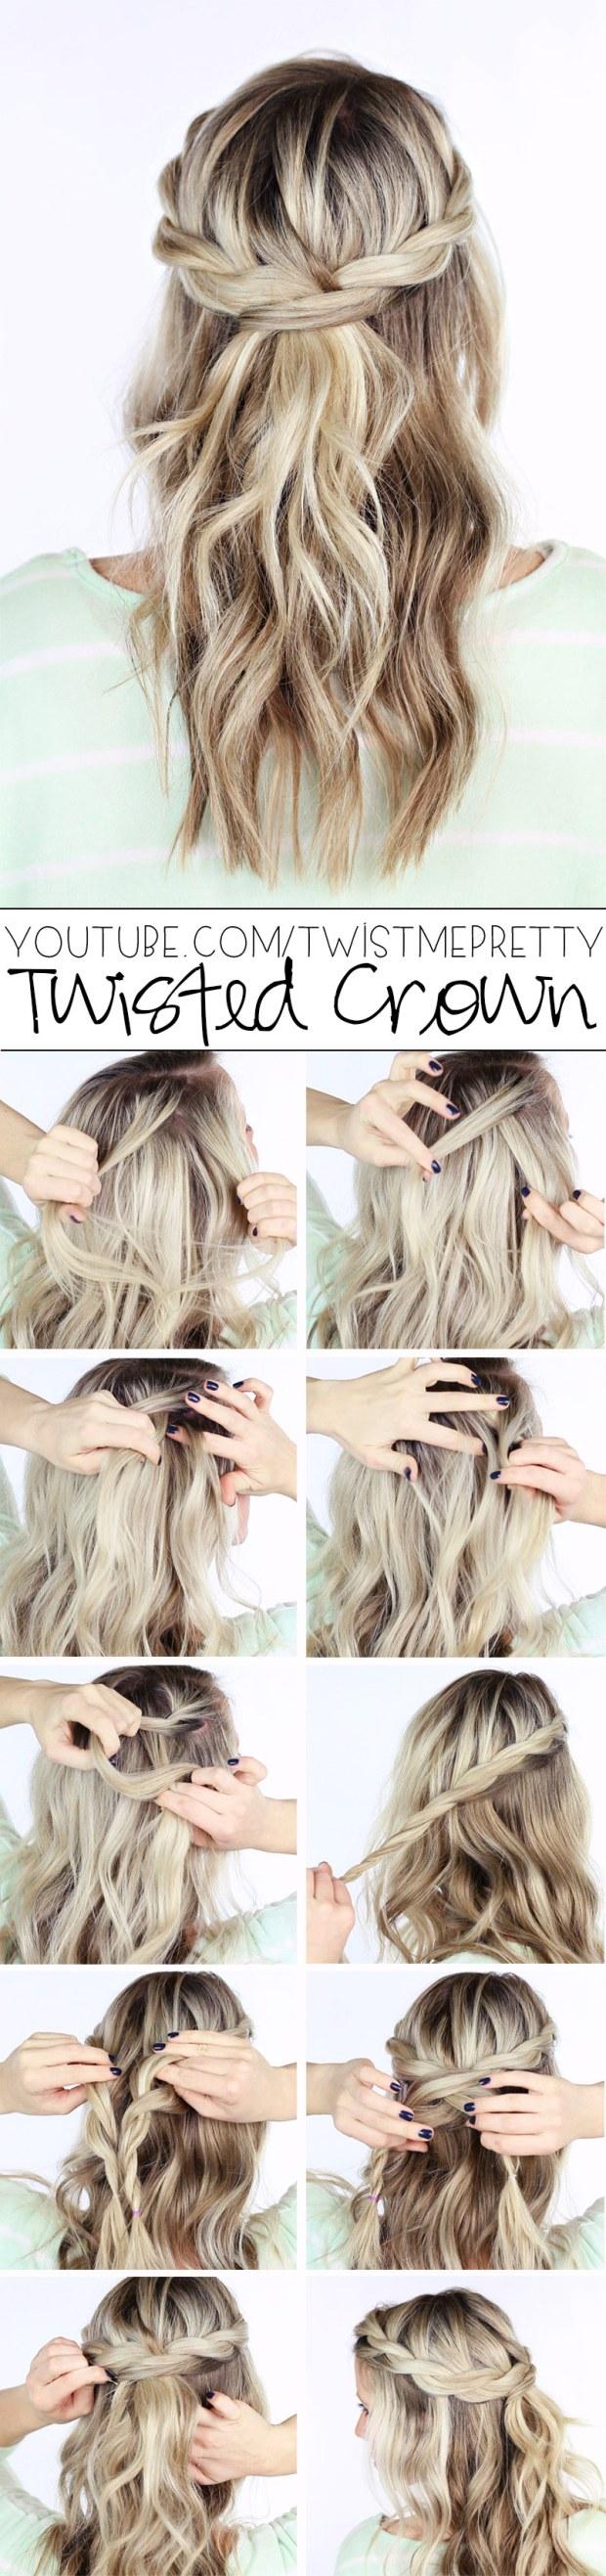 DIY twisted braid crown wedding hairstyle